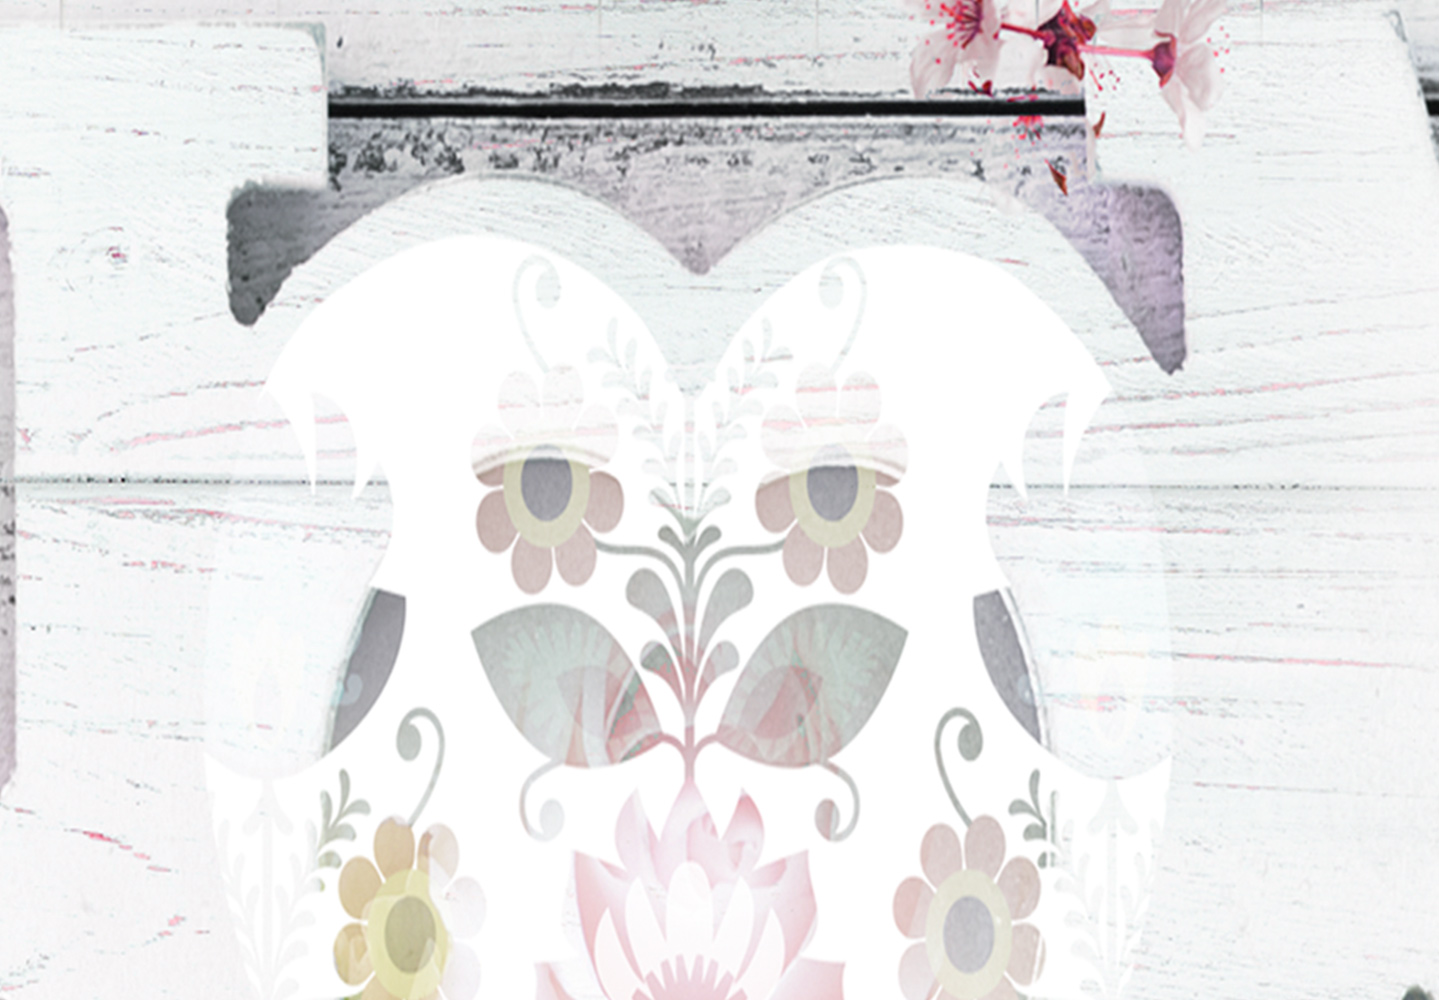 XXXL Wandbild Riesenformat Kunstdruck Leinwandbild moderne Bilder m-C-0266-ak-f